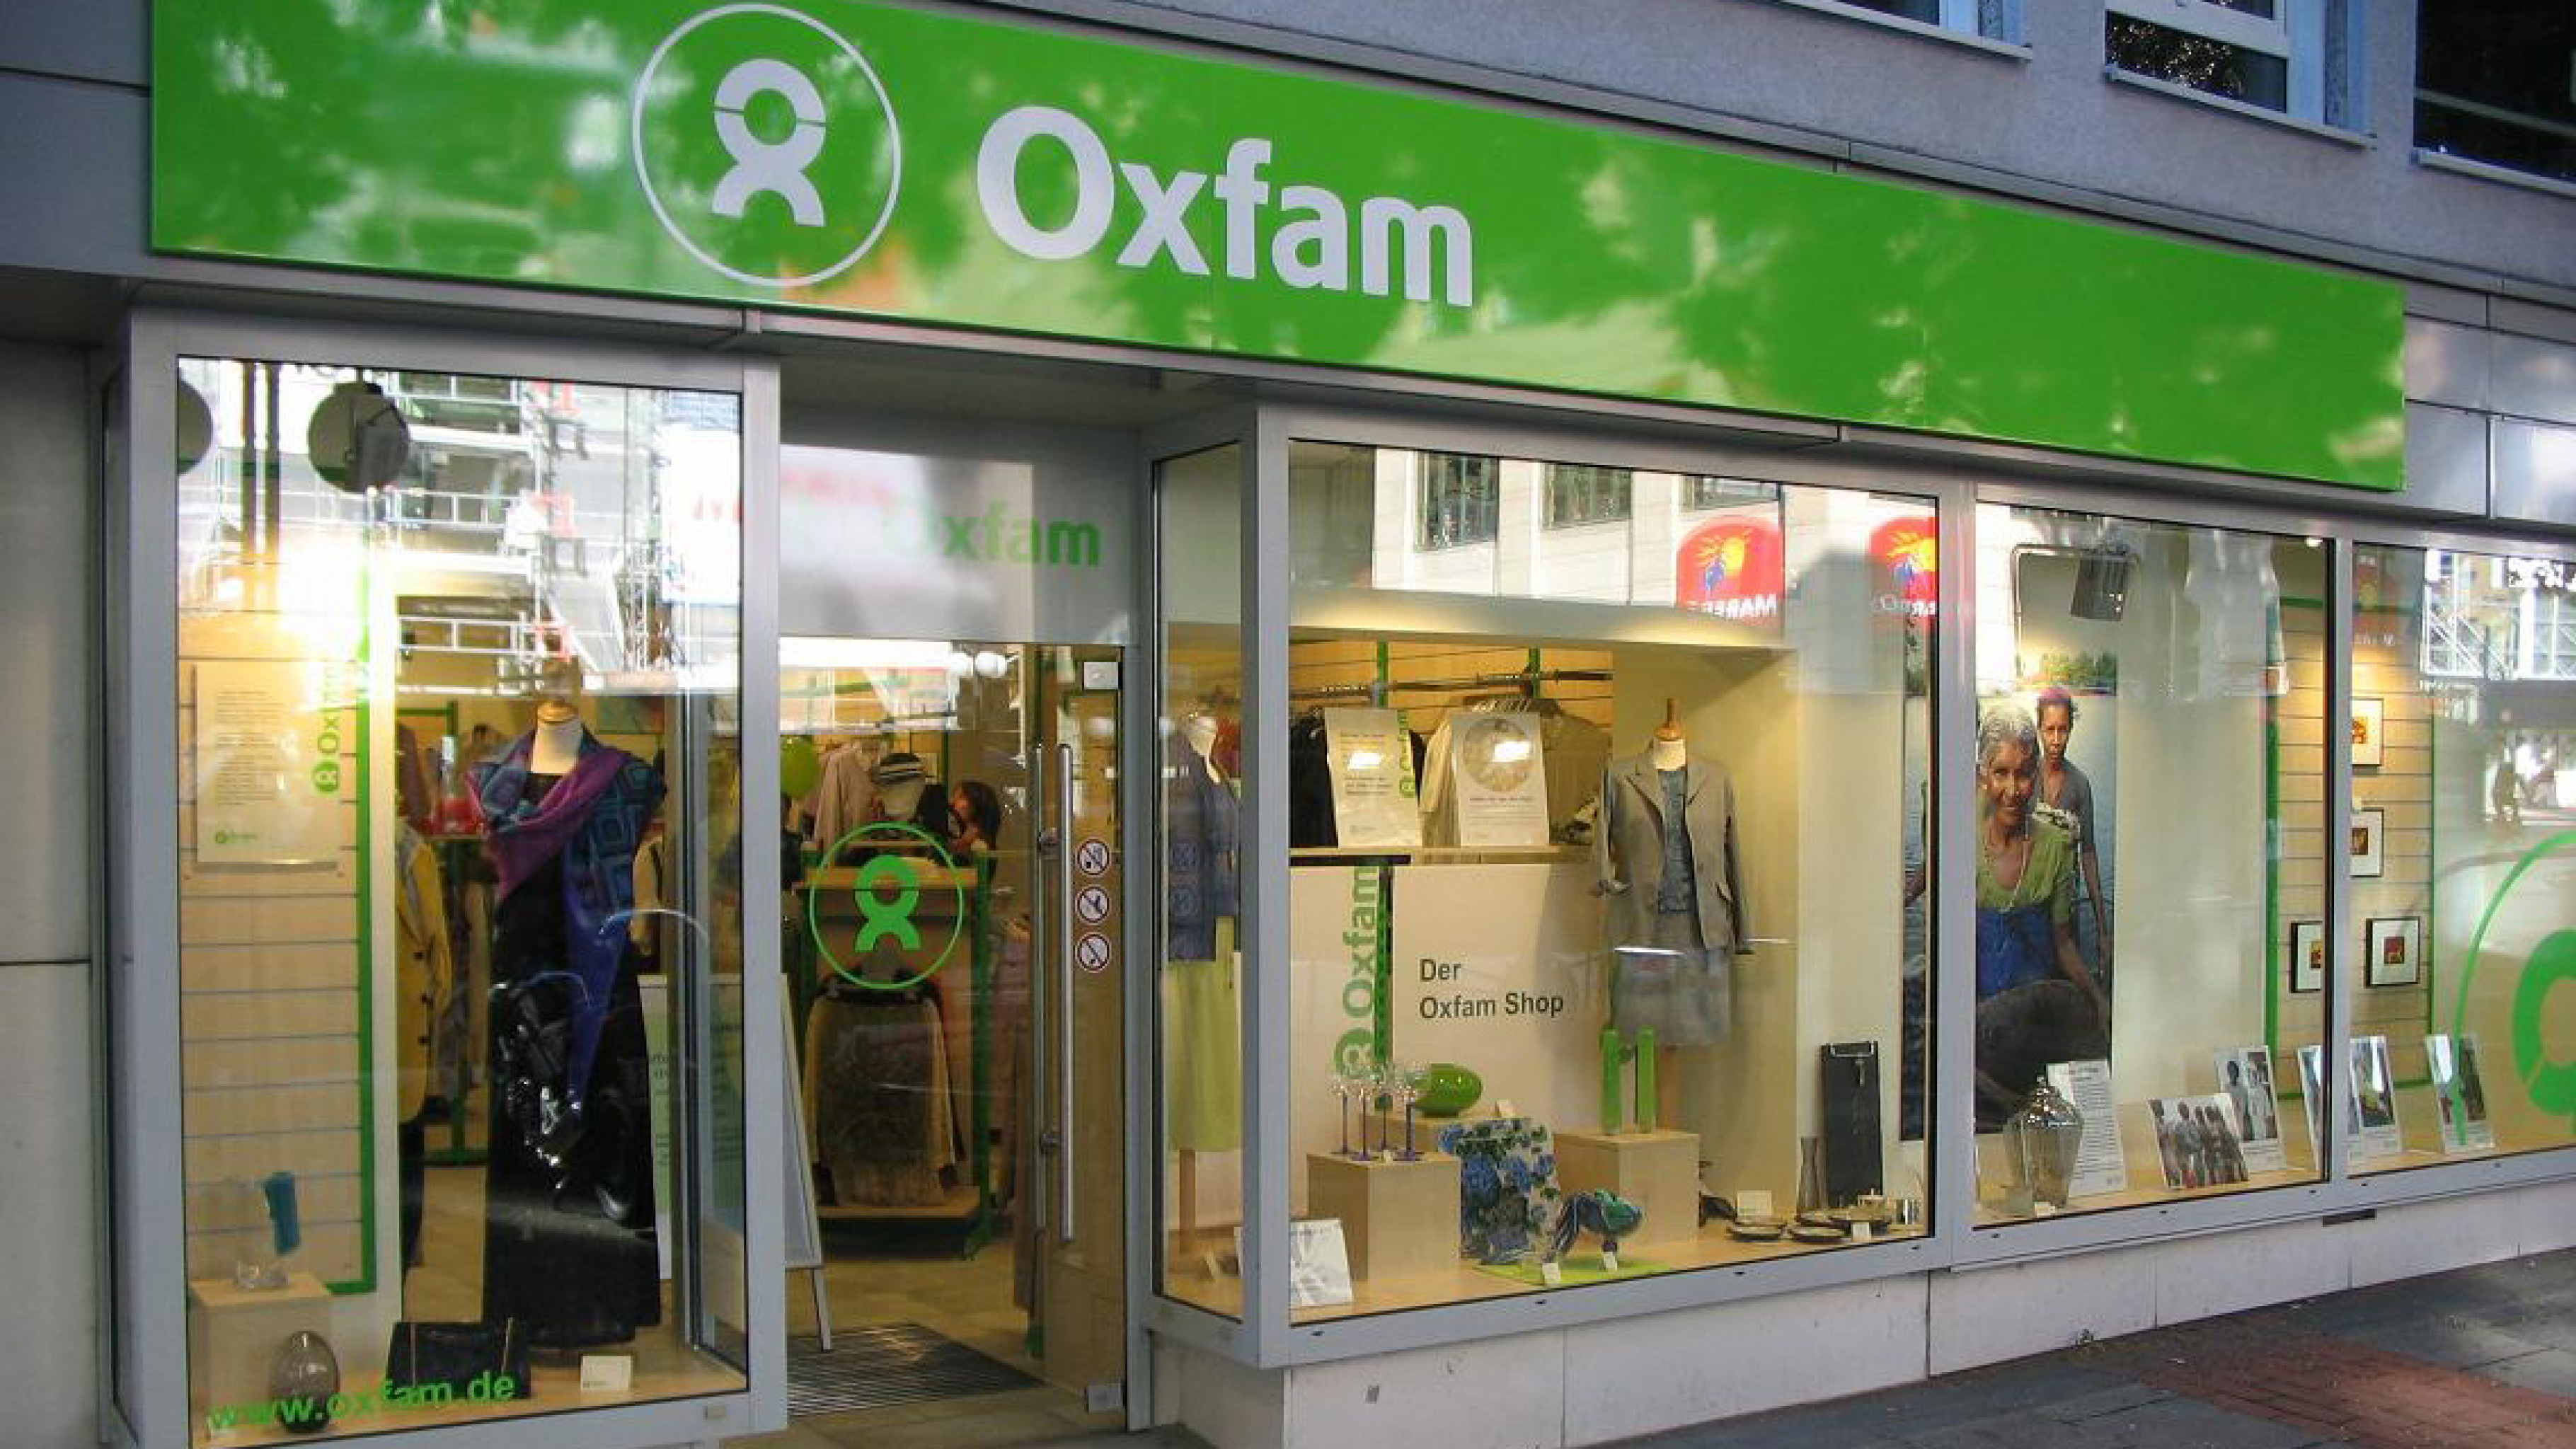 secondhand kaufen spenden in stuttgart oxfam shop. Black Bedroom Furniture Sets. Home Design Ideas